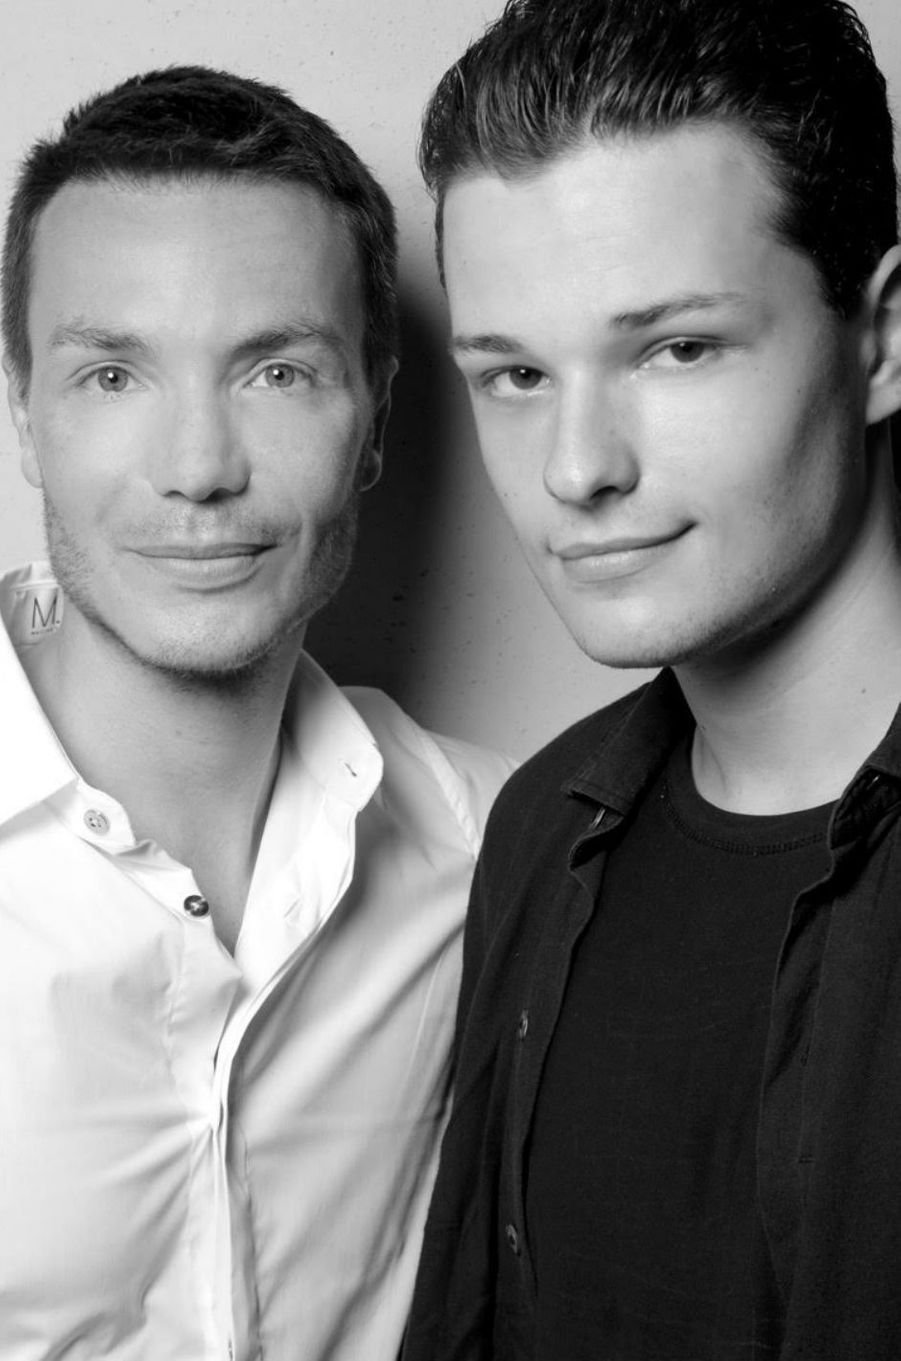 Maxime Simoens et Jules Benchetrit